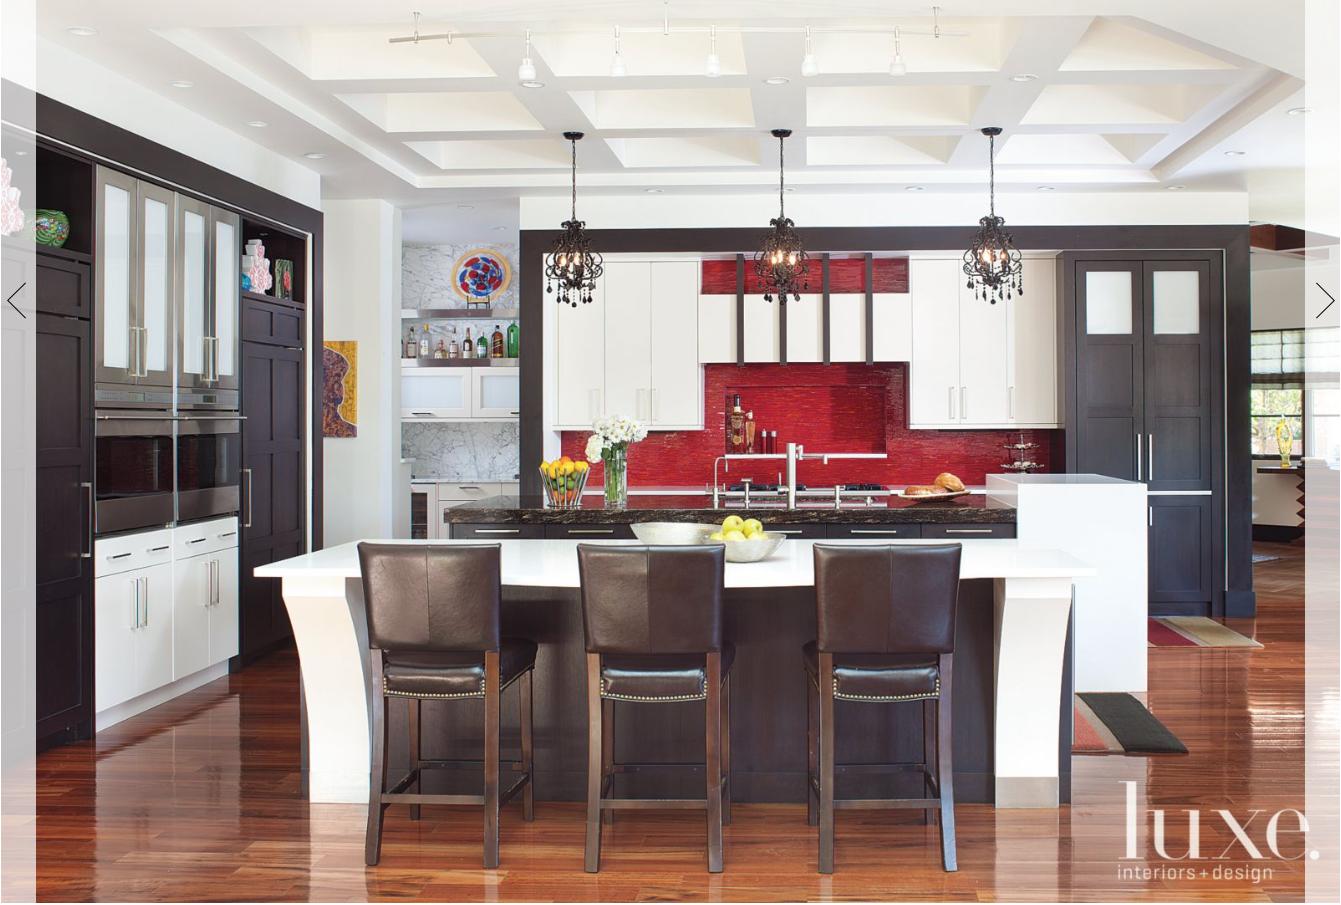 Luxe. Interiors + Design Magazine  2014 GOLD LIST